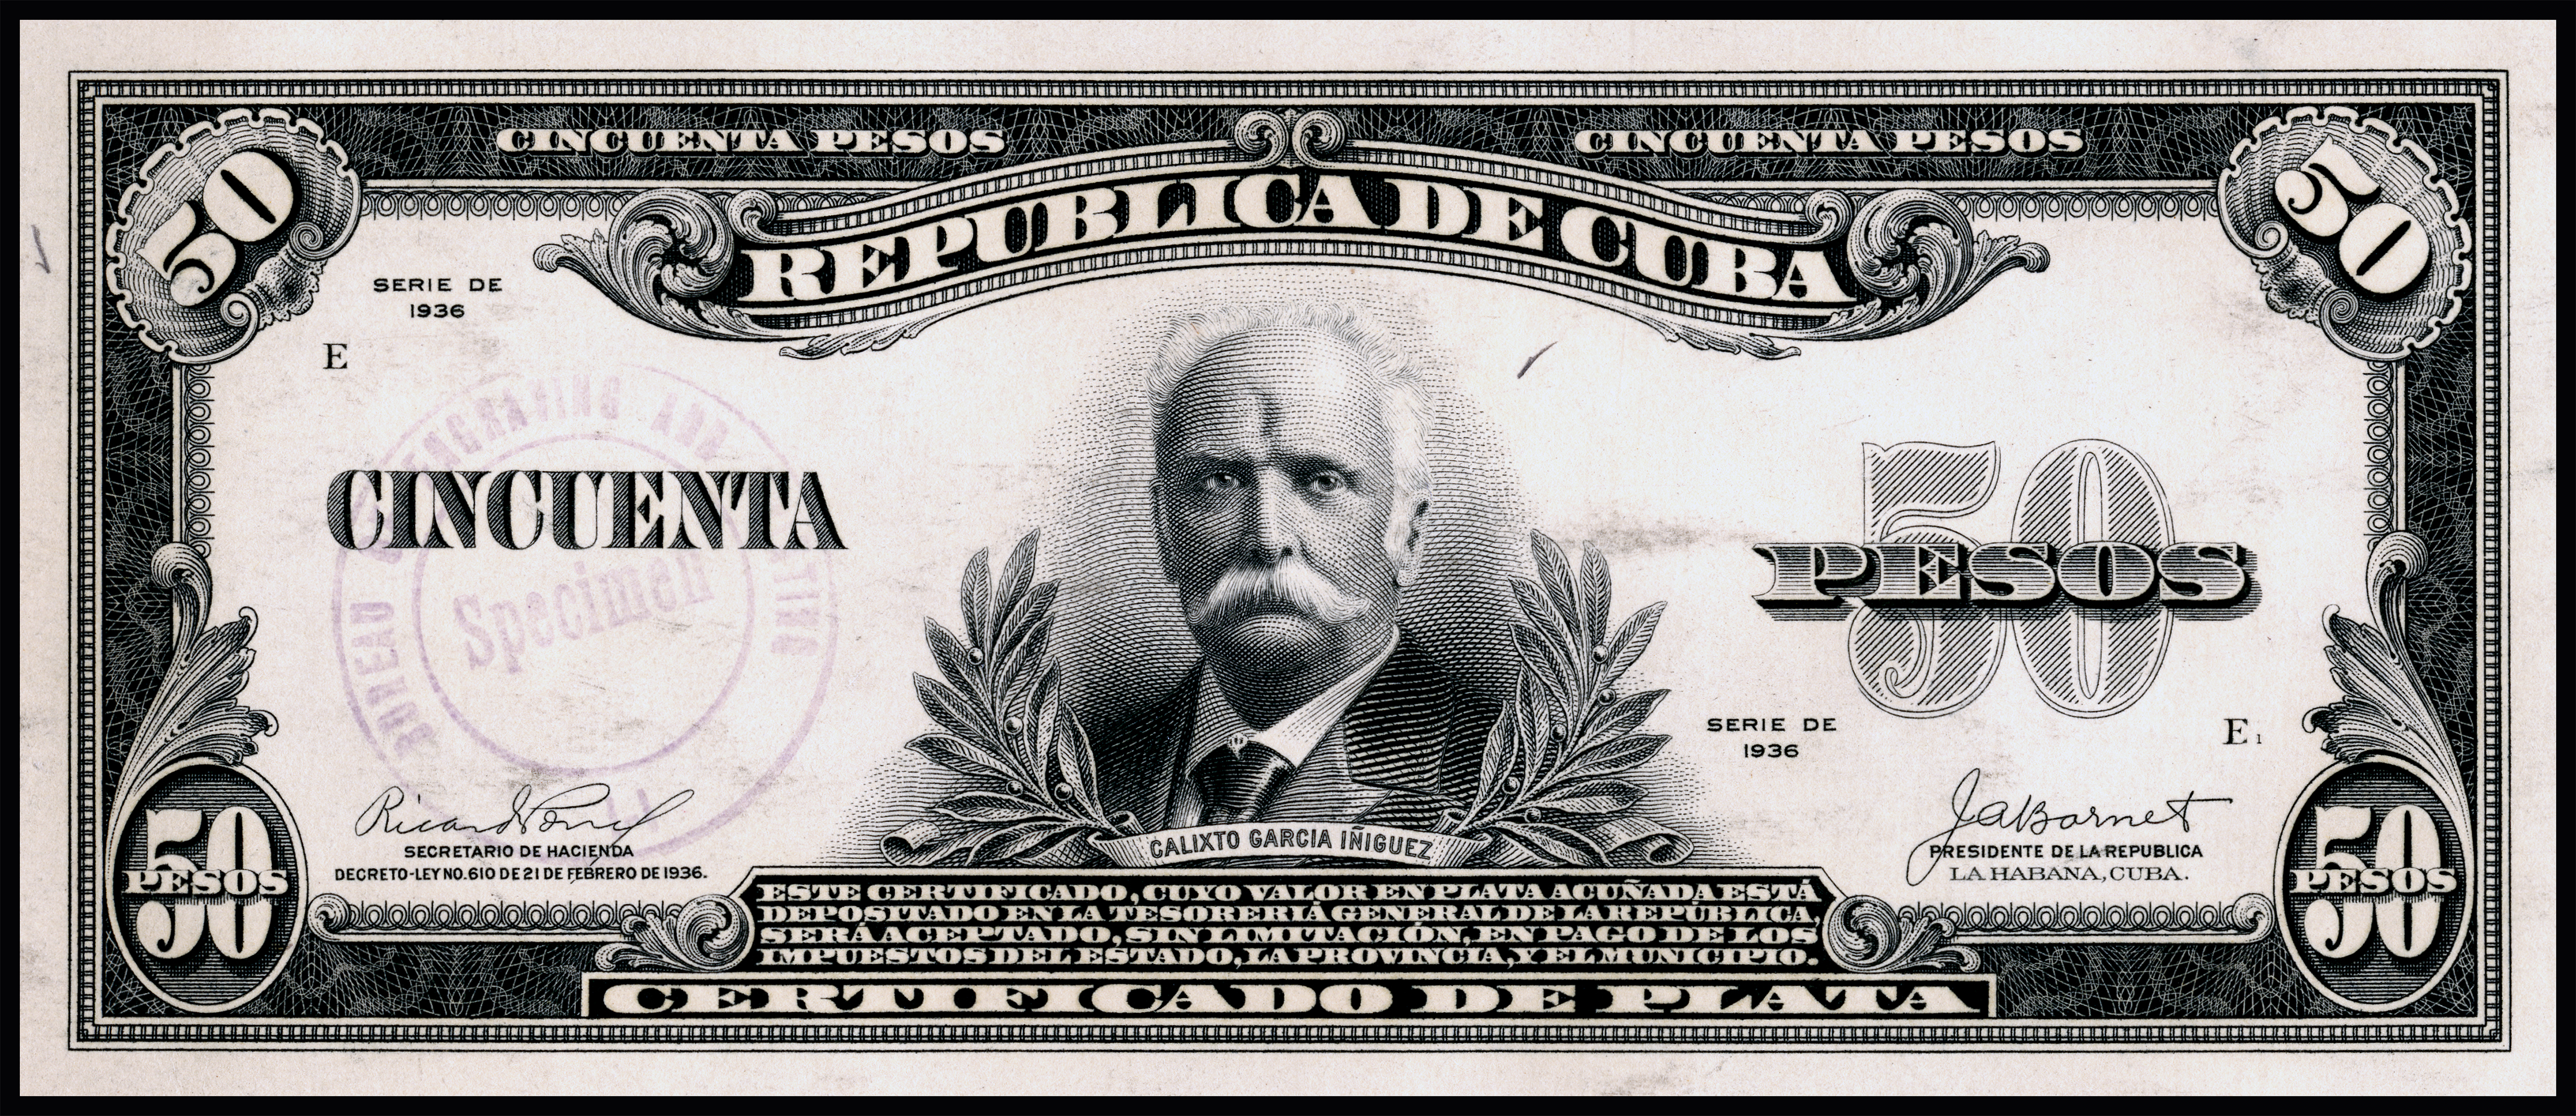 File Us Bep República De Cuba Certified Proof 50 Silver Pesos 1936 Cub 73b Jpg